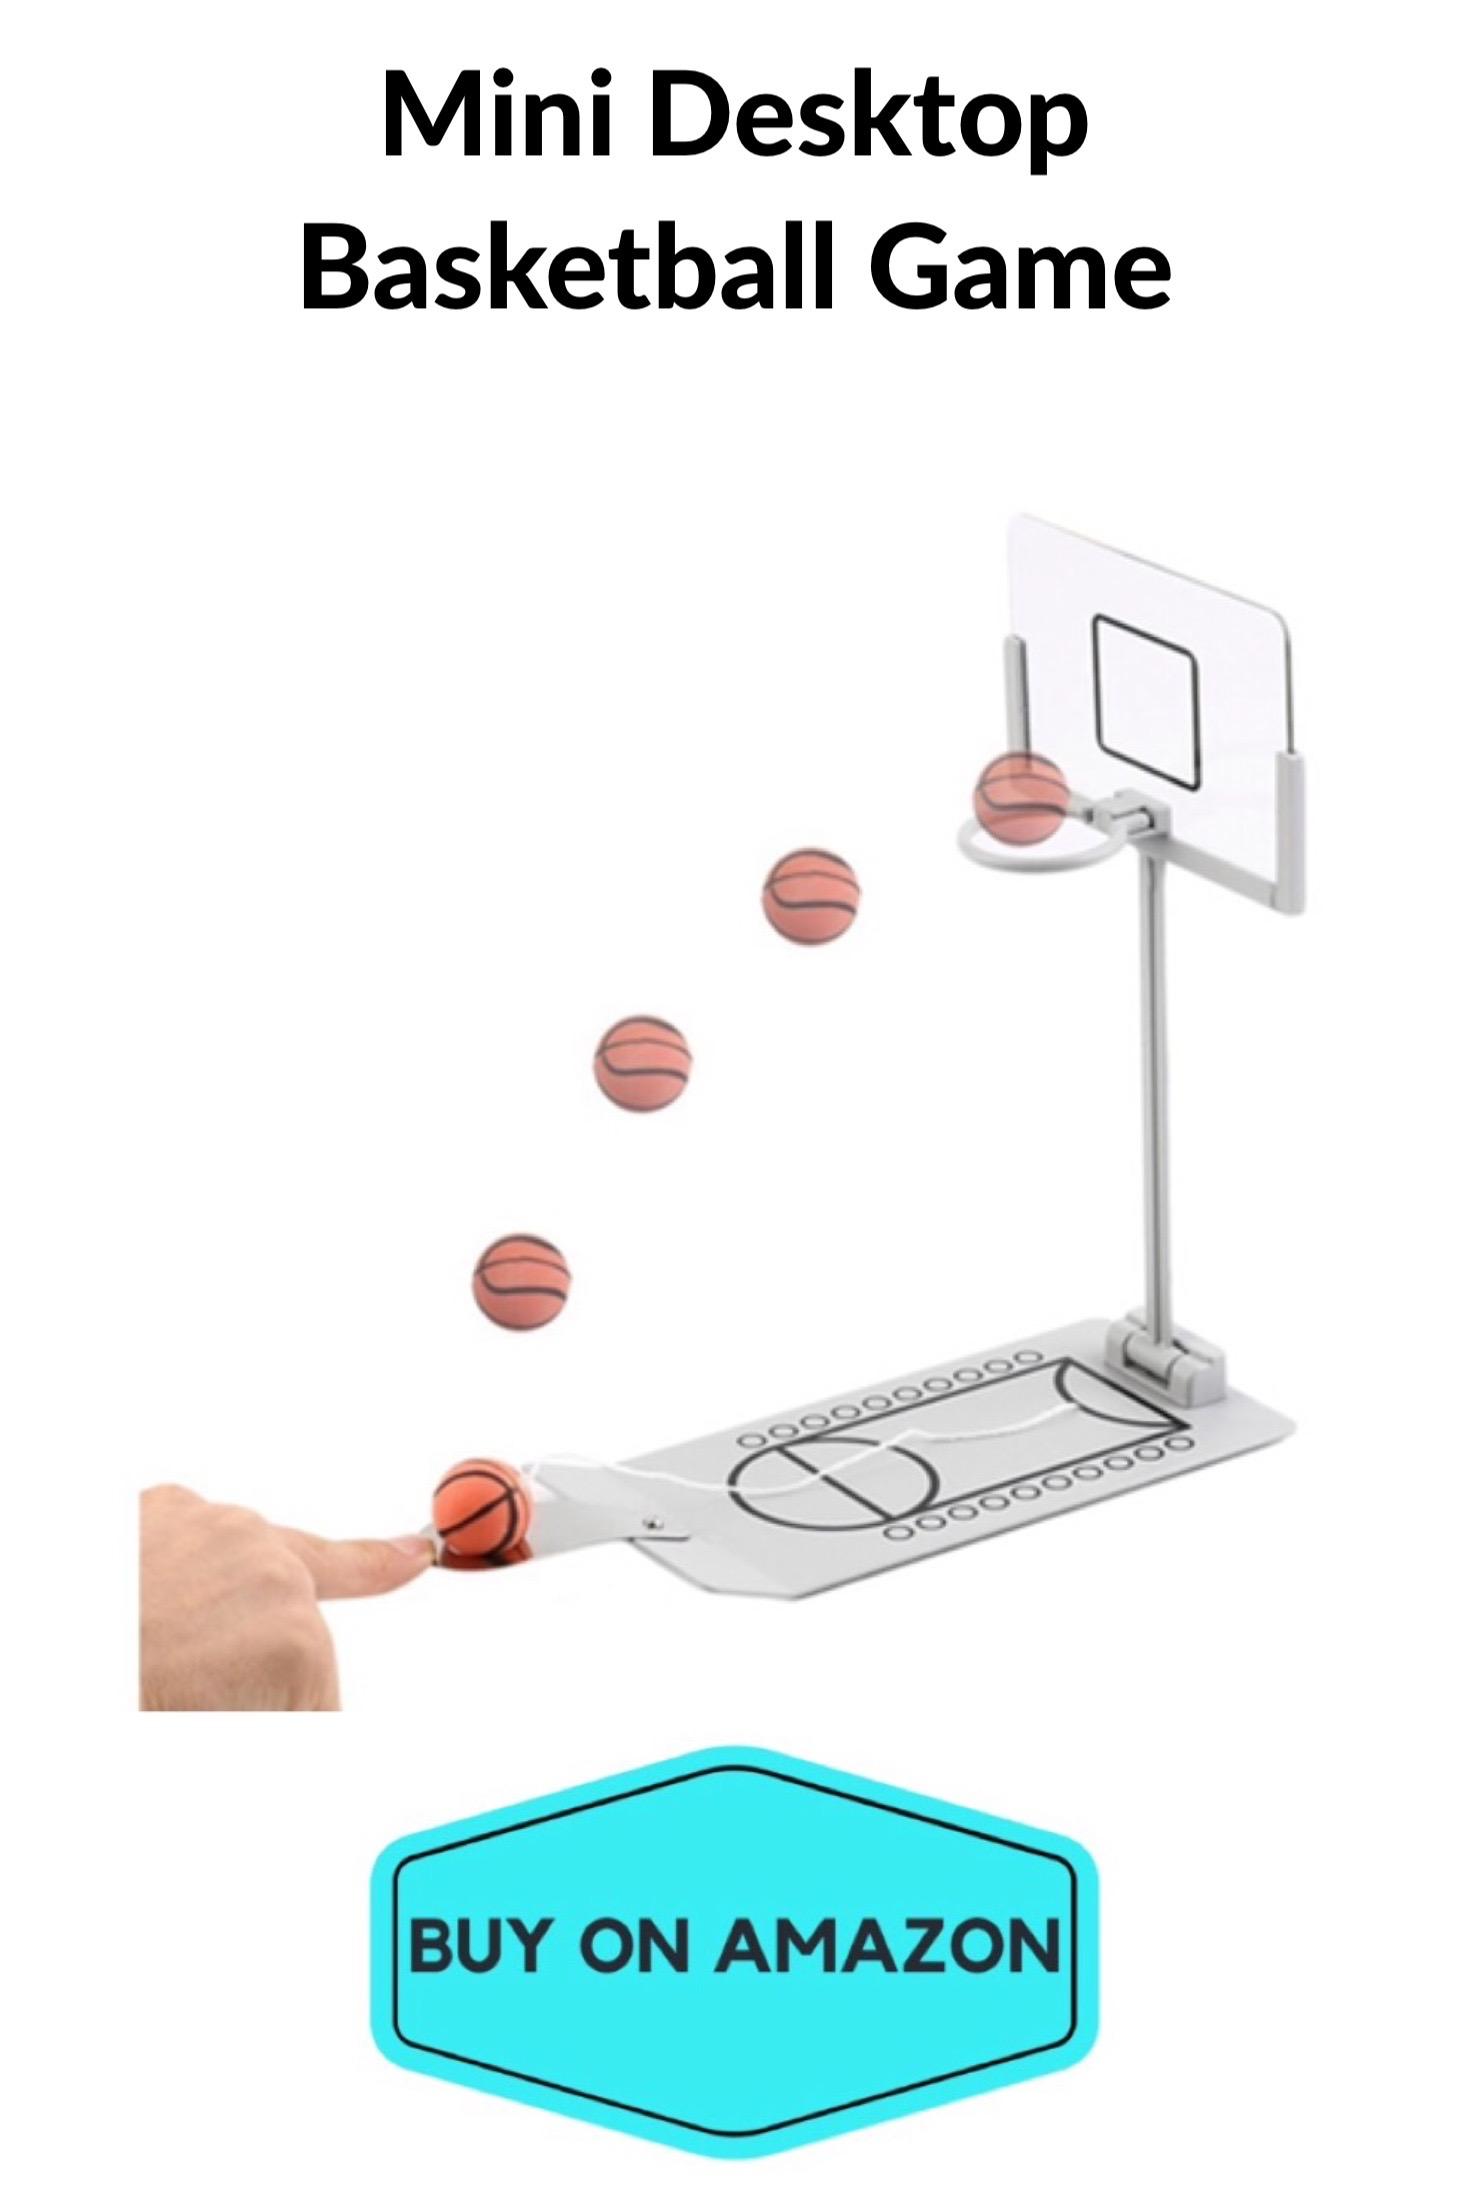 Mini Desktop Basketball Game